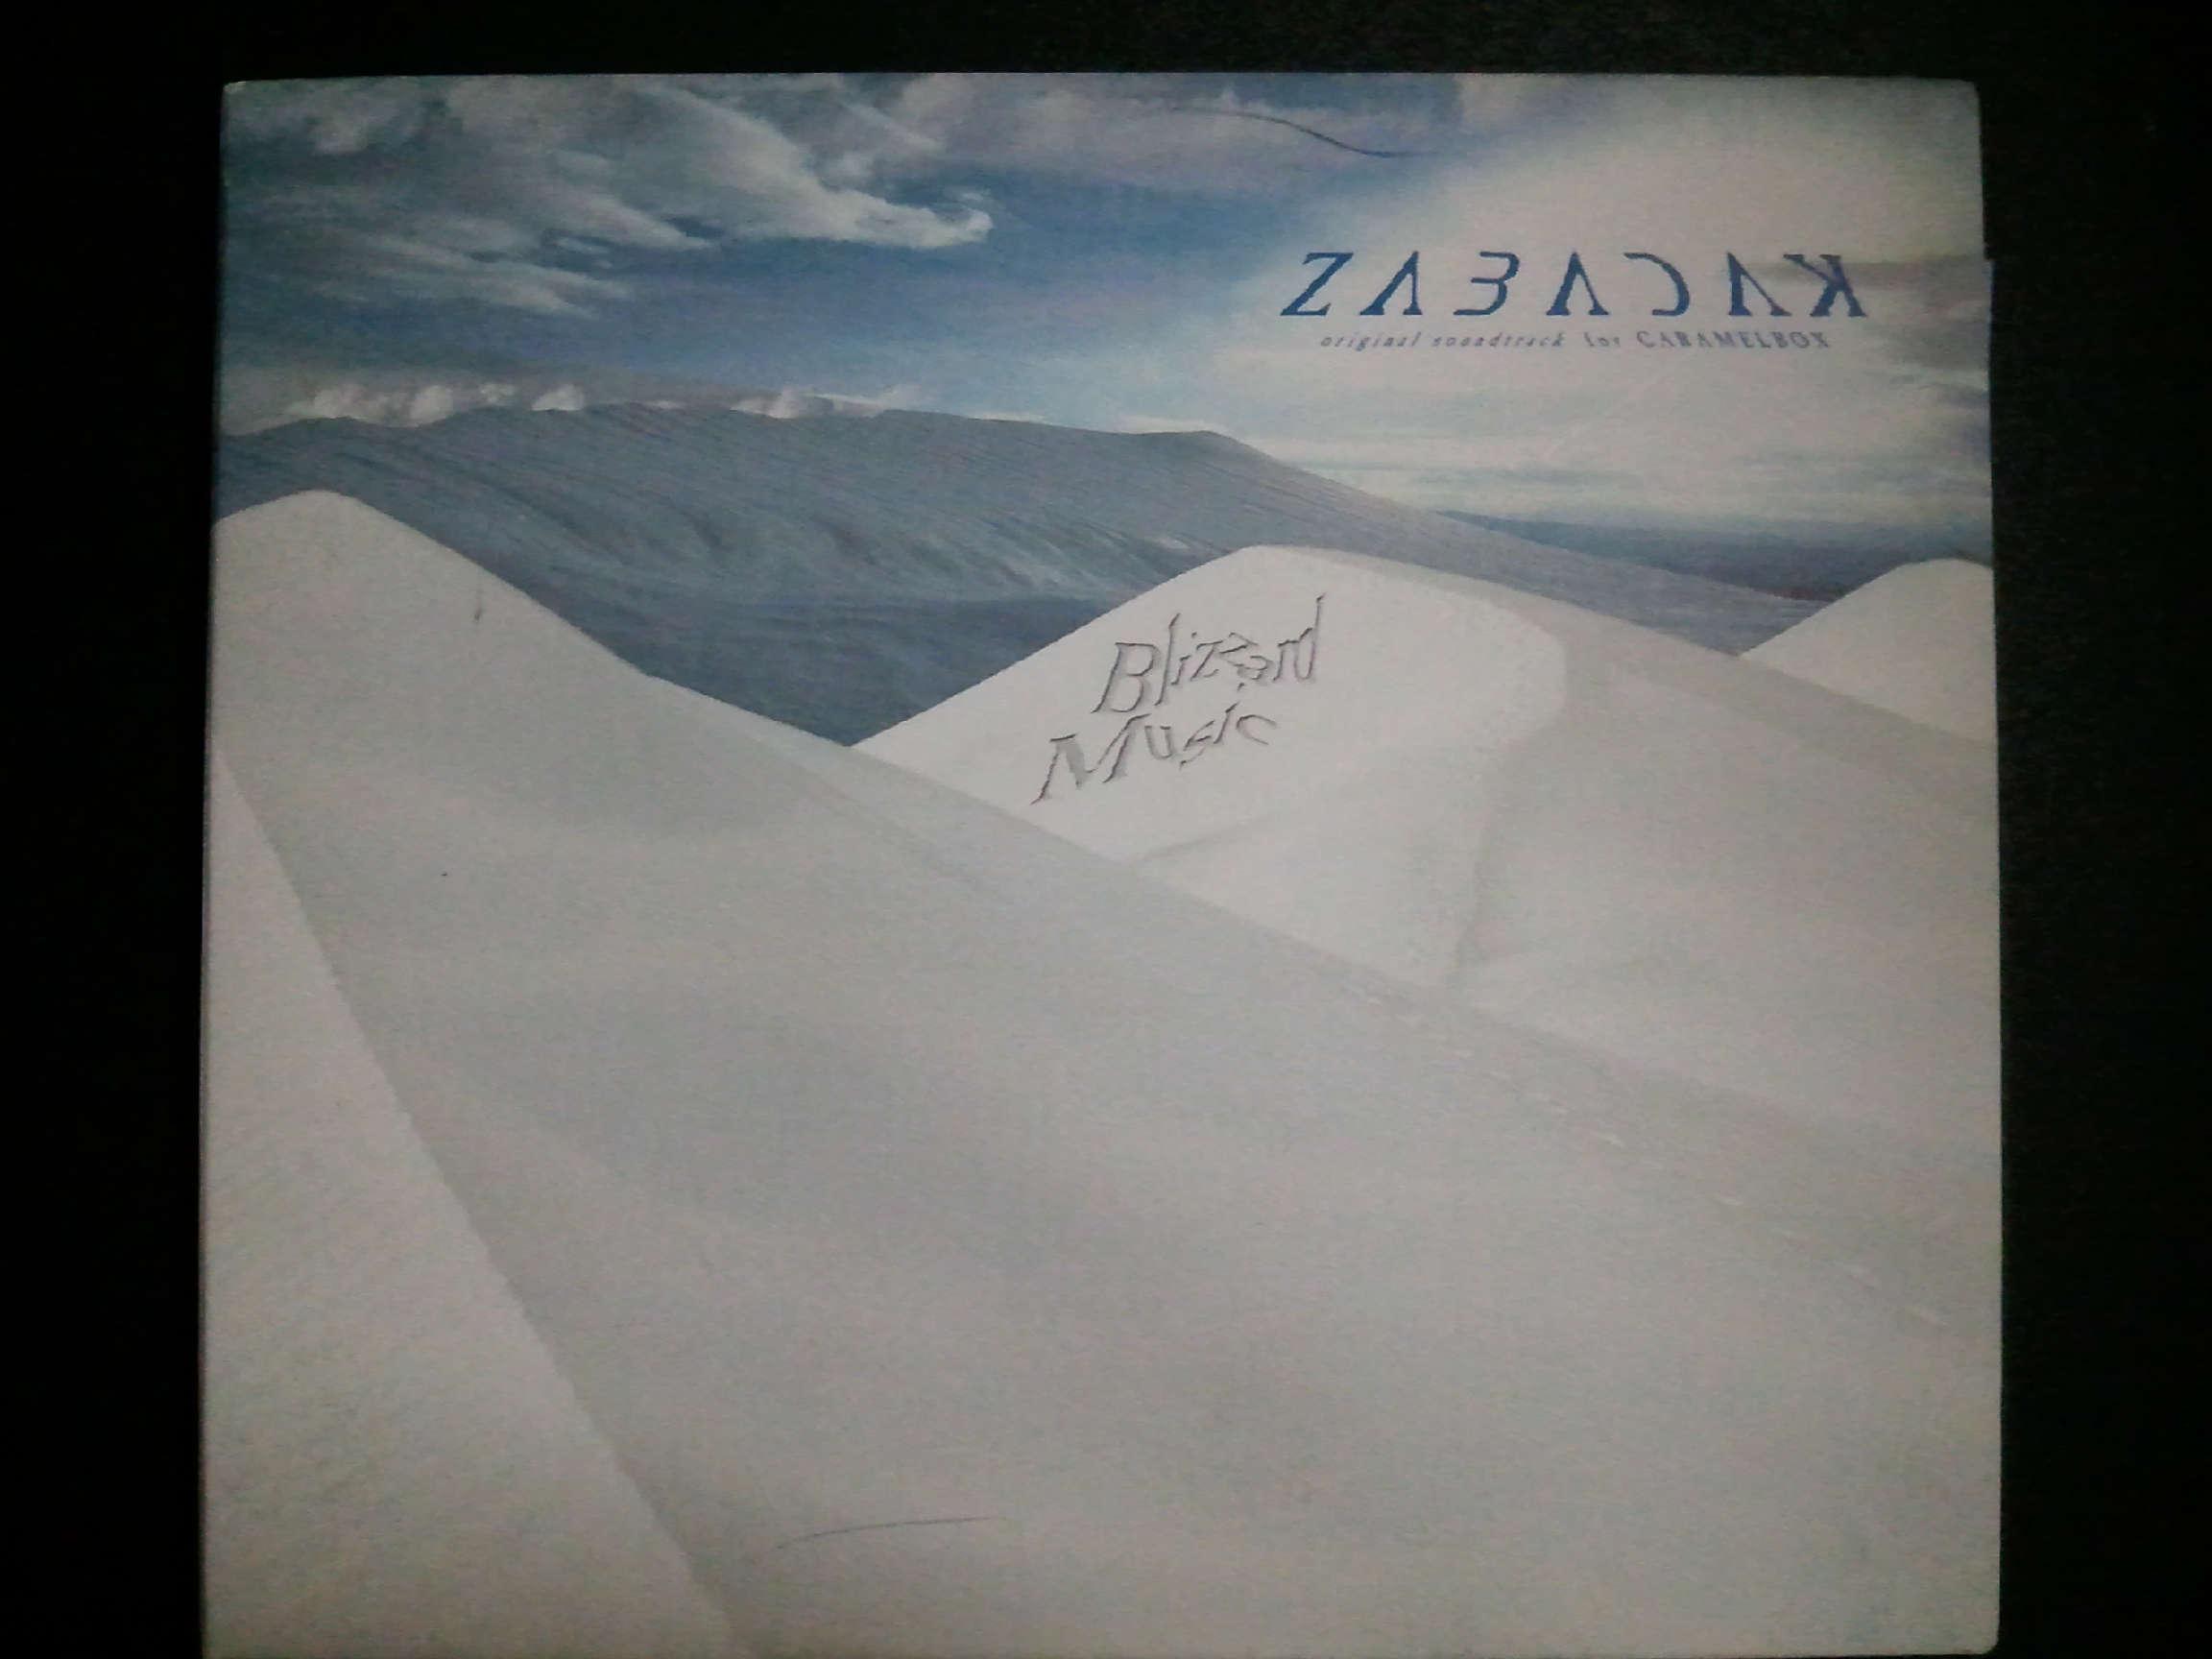 ZABADAK Blizzard Music